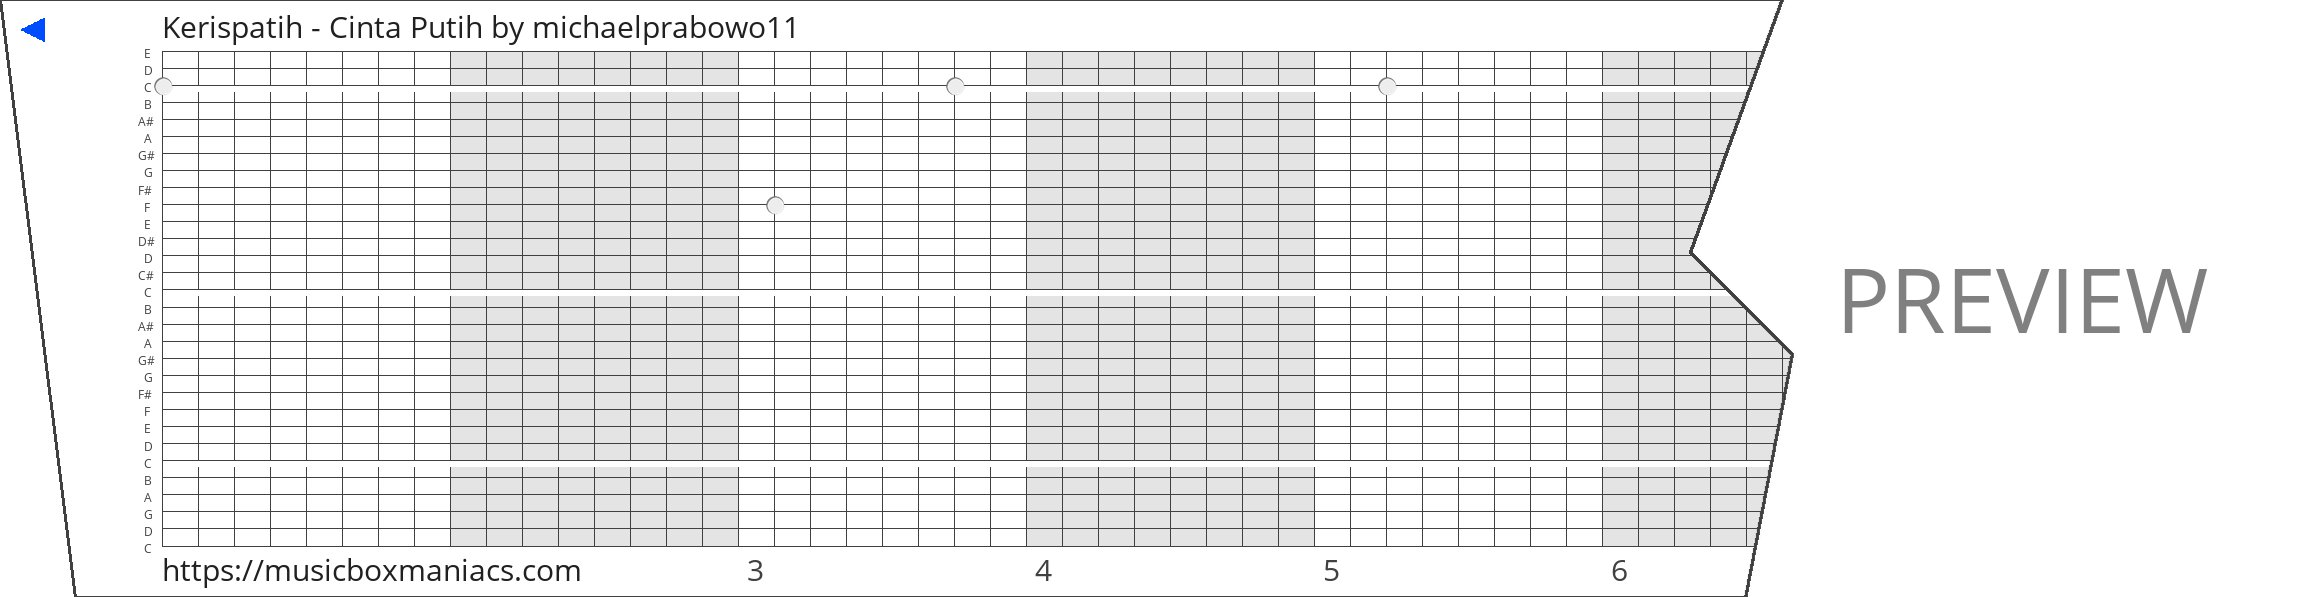 Kerispatih - Cinta Putih 30 note music box paper strip